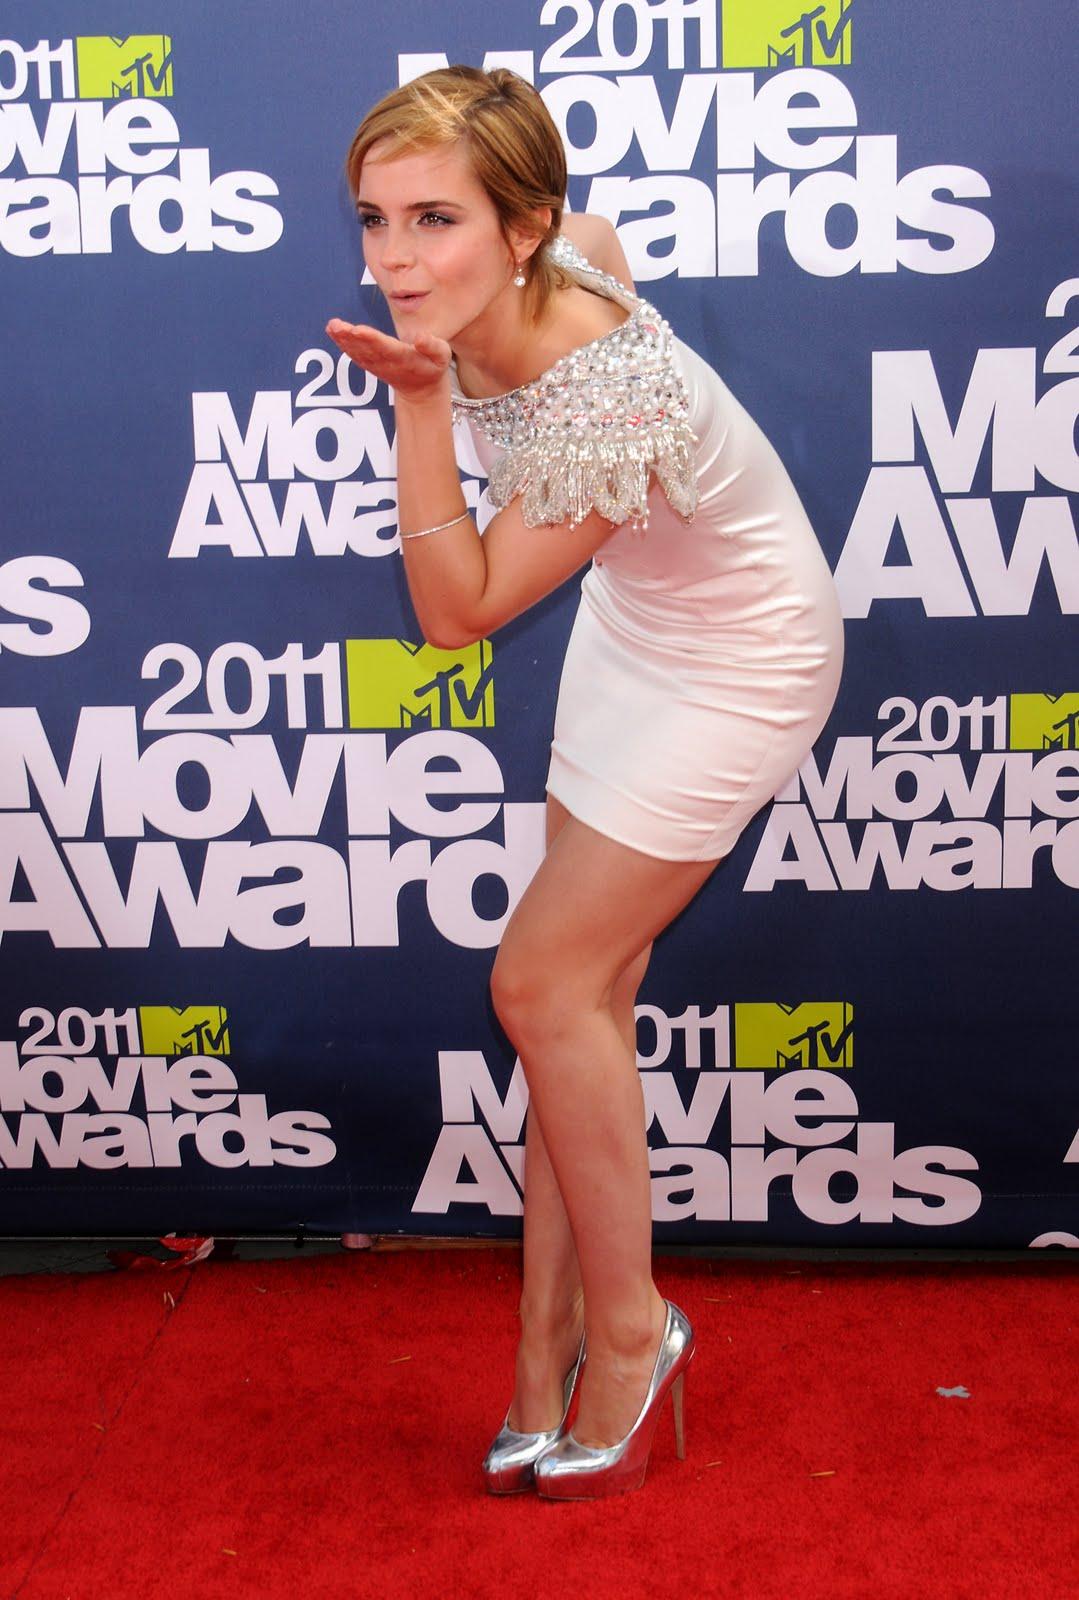 http://4.bp.blogspot.com/-VqkVPR9bIdY/Te4PKHJ_jzI/AAAAAAAABWg/xDivG7QEReY/s1600/2011+MTV+MOVIE+AWARDS+-+EMMA+WATSON.jpg